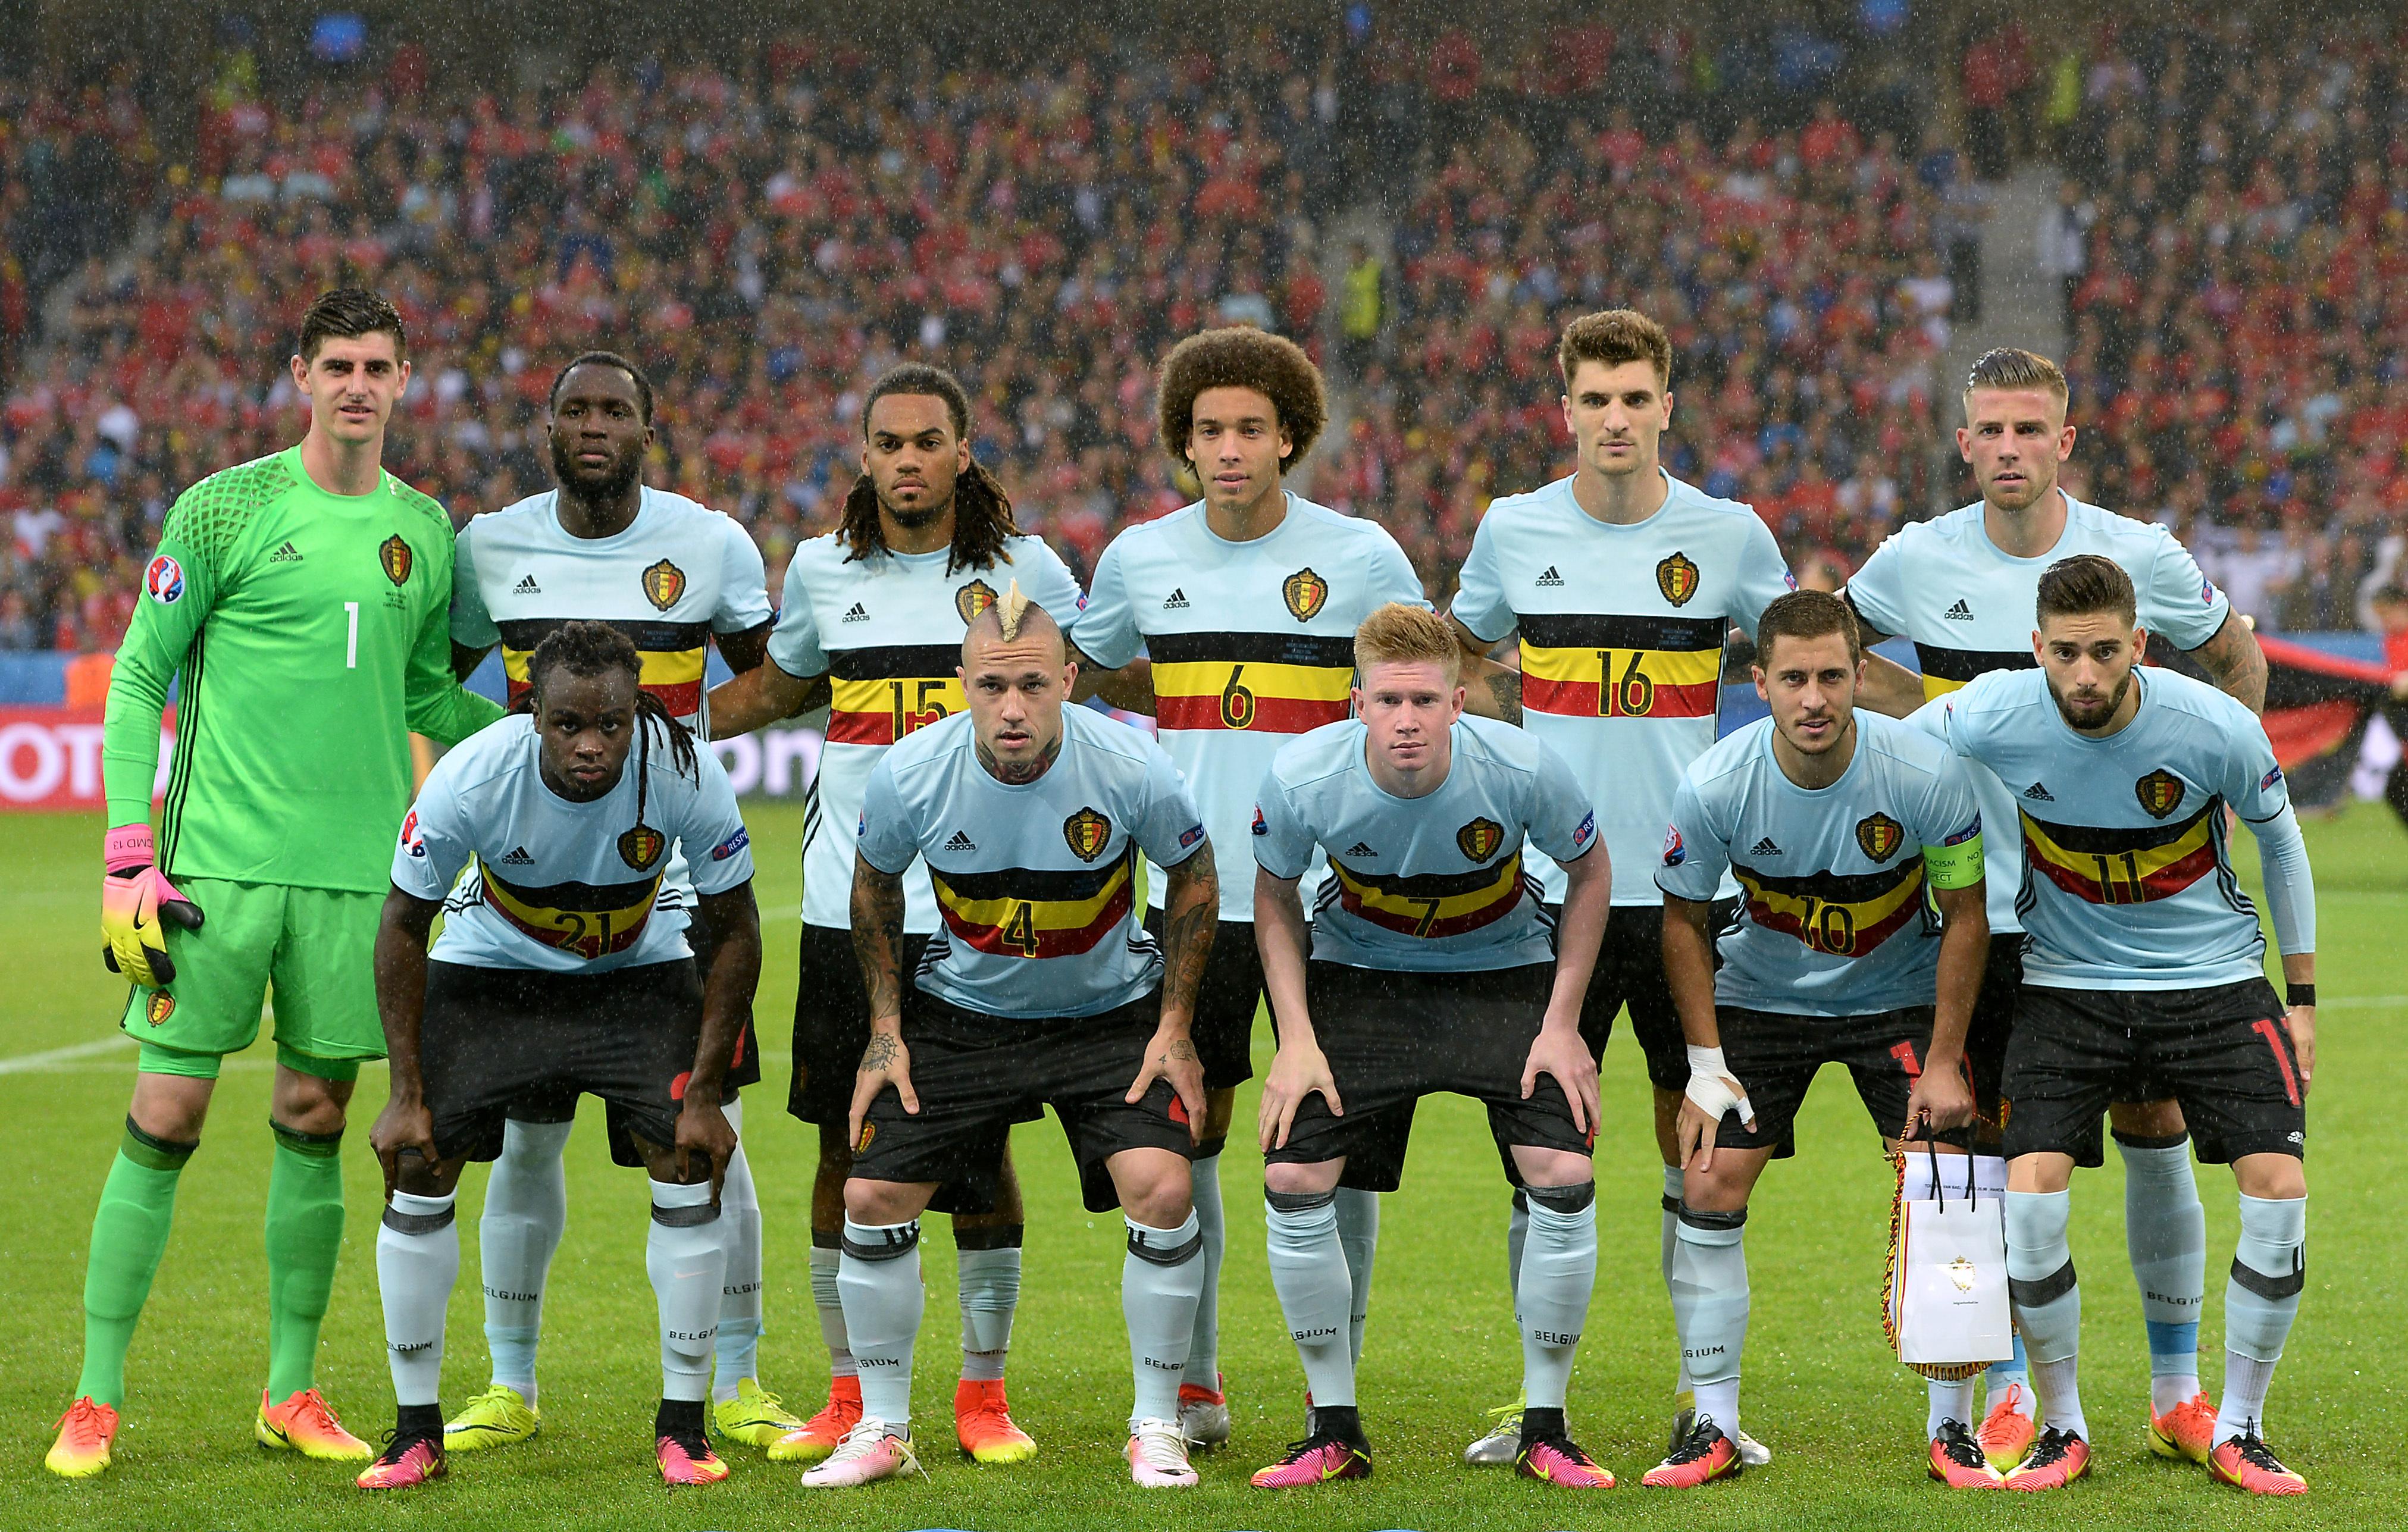 Manchester United striker Romelu Lukaku wants 'more respect'